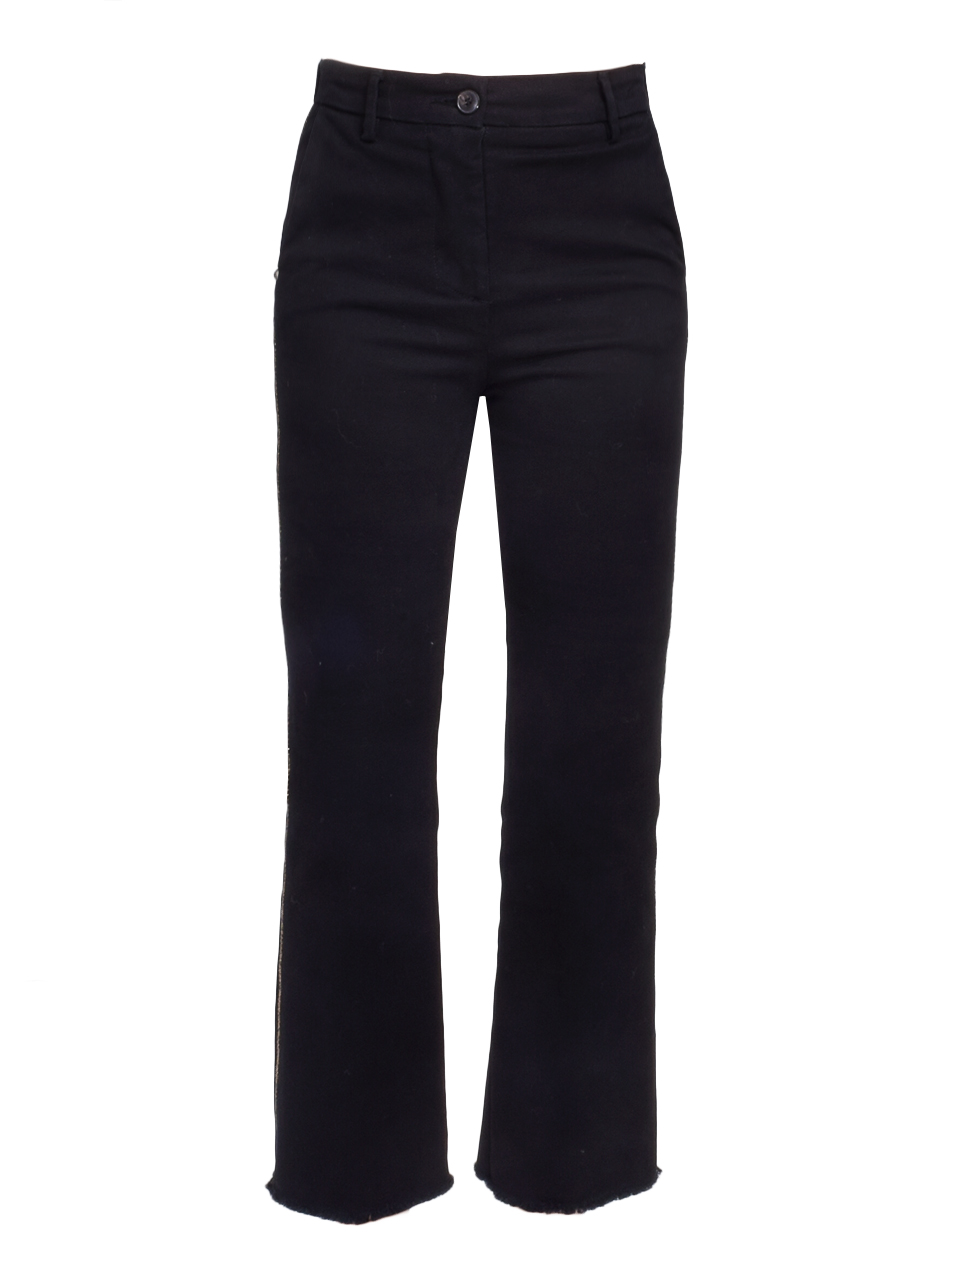 WHITE SAND Ava Jean in Black Product Shot